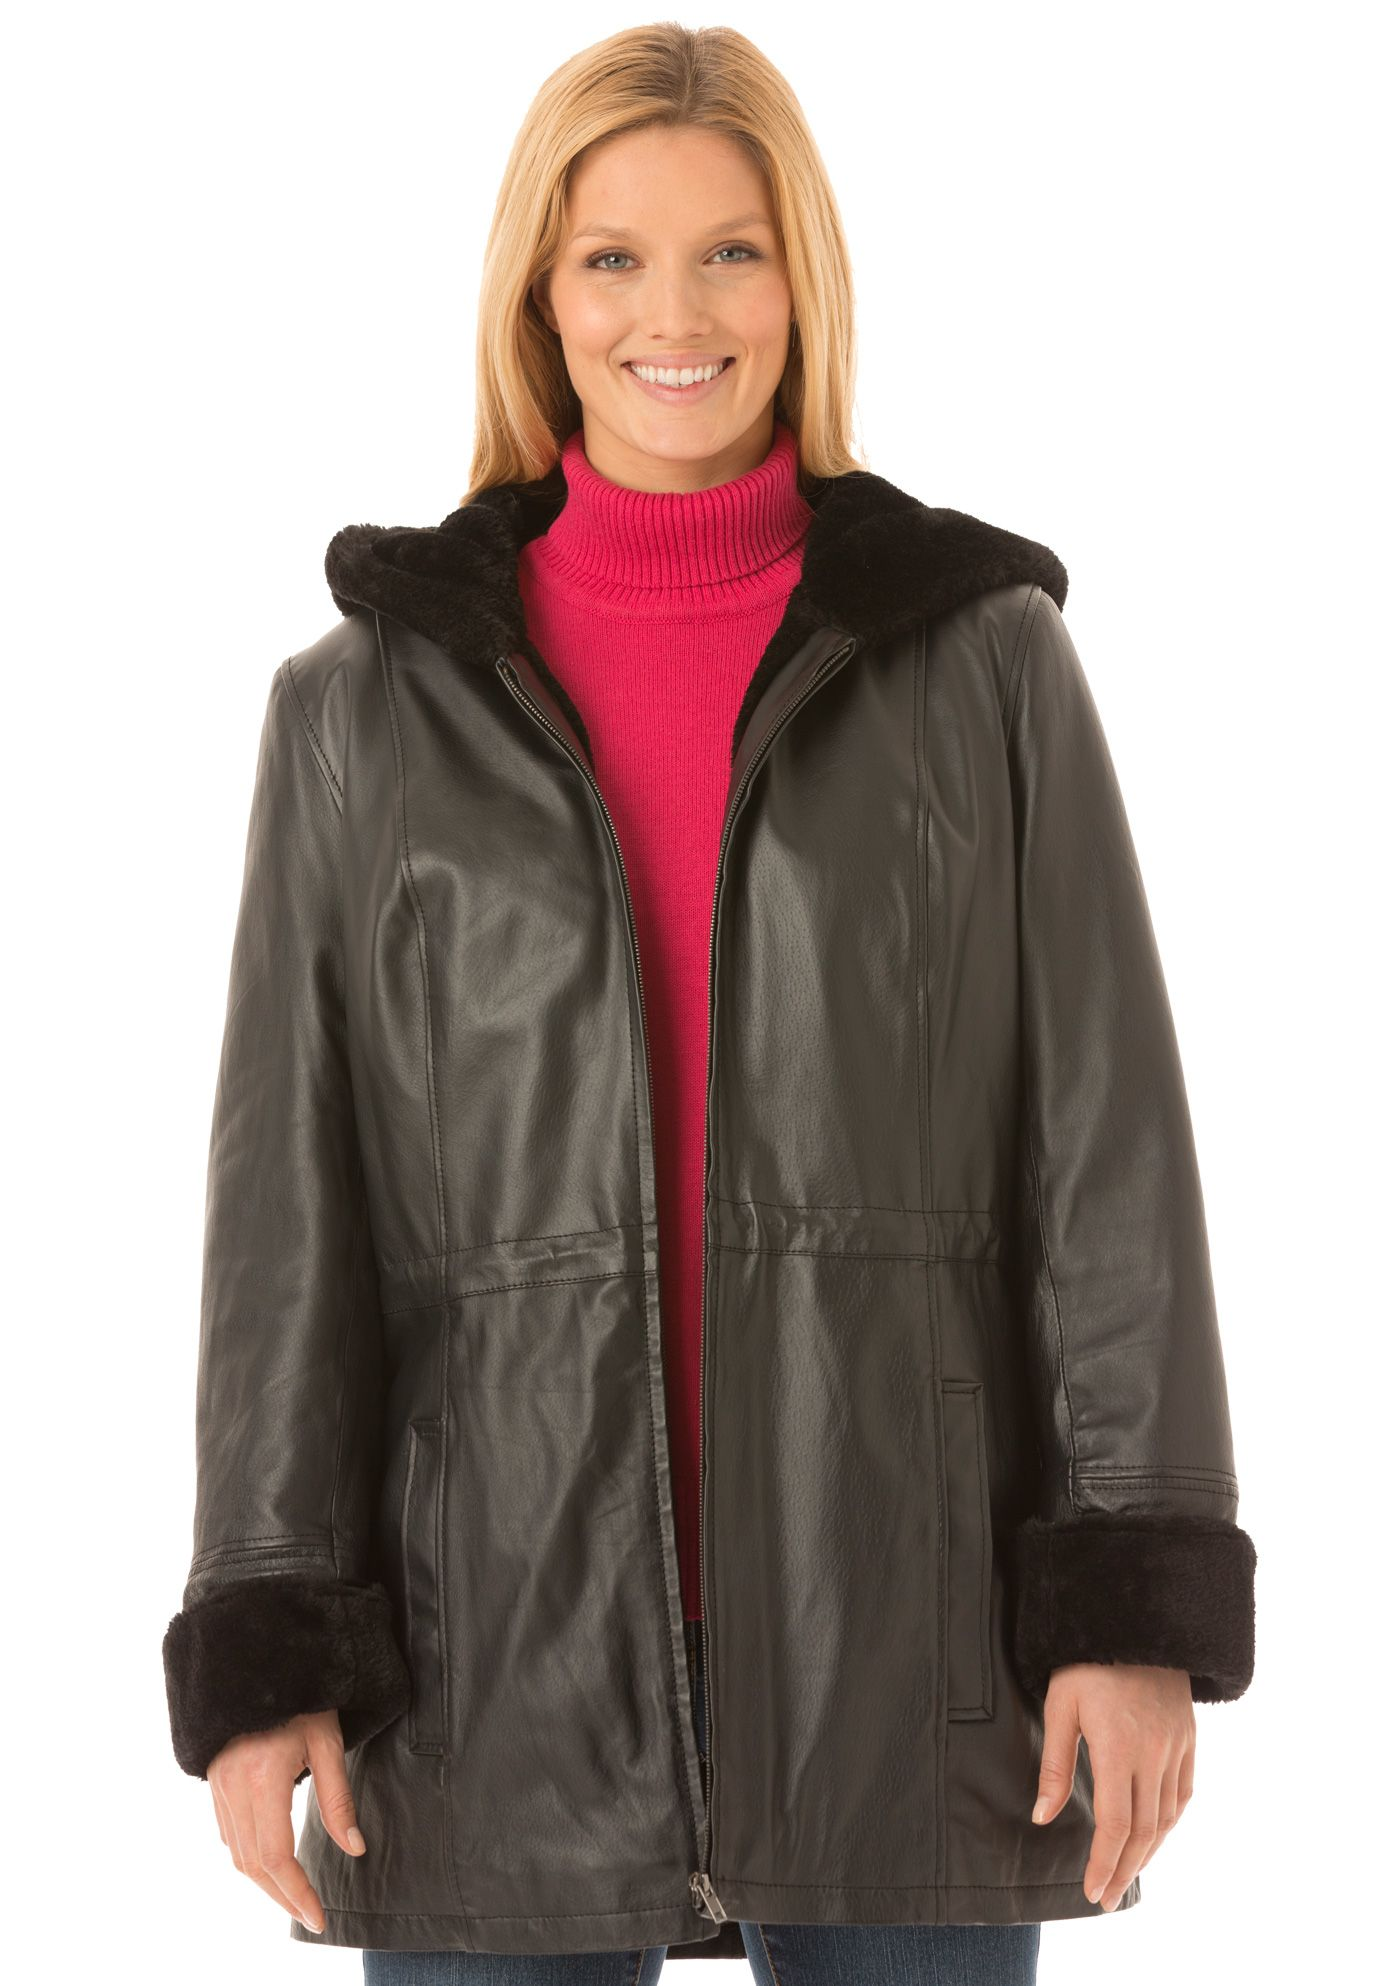 Leather Hooded Anorak Jacket Has Plush Shearling Look Trim Hooded Anorak Jacket Anorak Jacket Anorak [ 1986 x 1380 Pixel ]